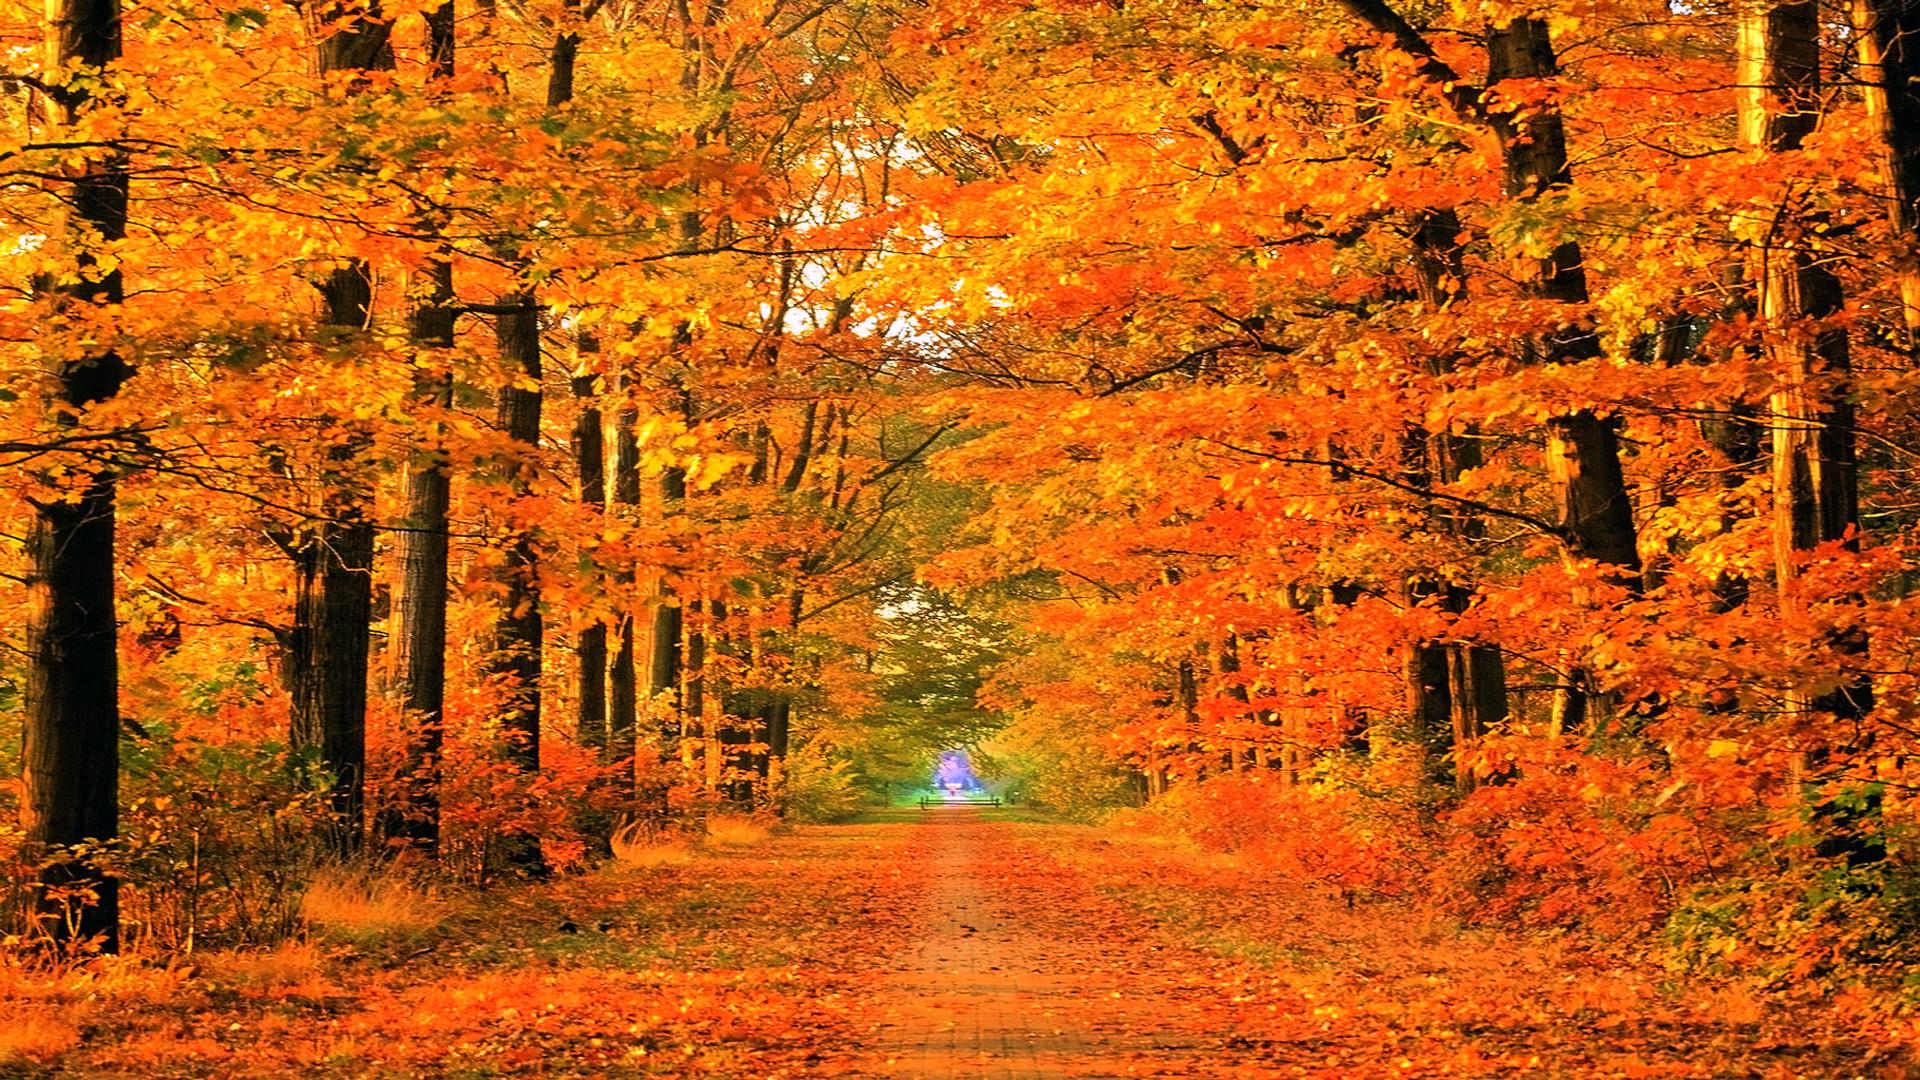 Autumn Wallpaper on Autumn Season Roads Parks Hd Wallpaper   General   777745